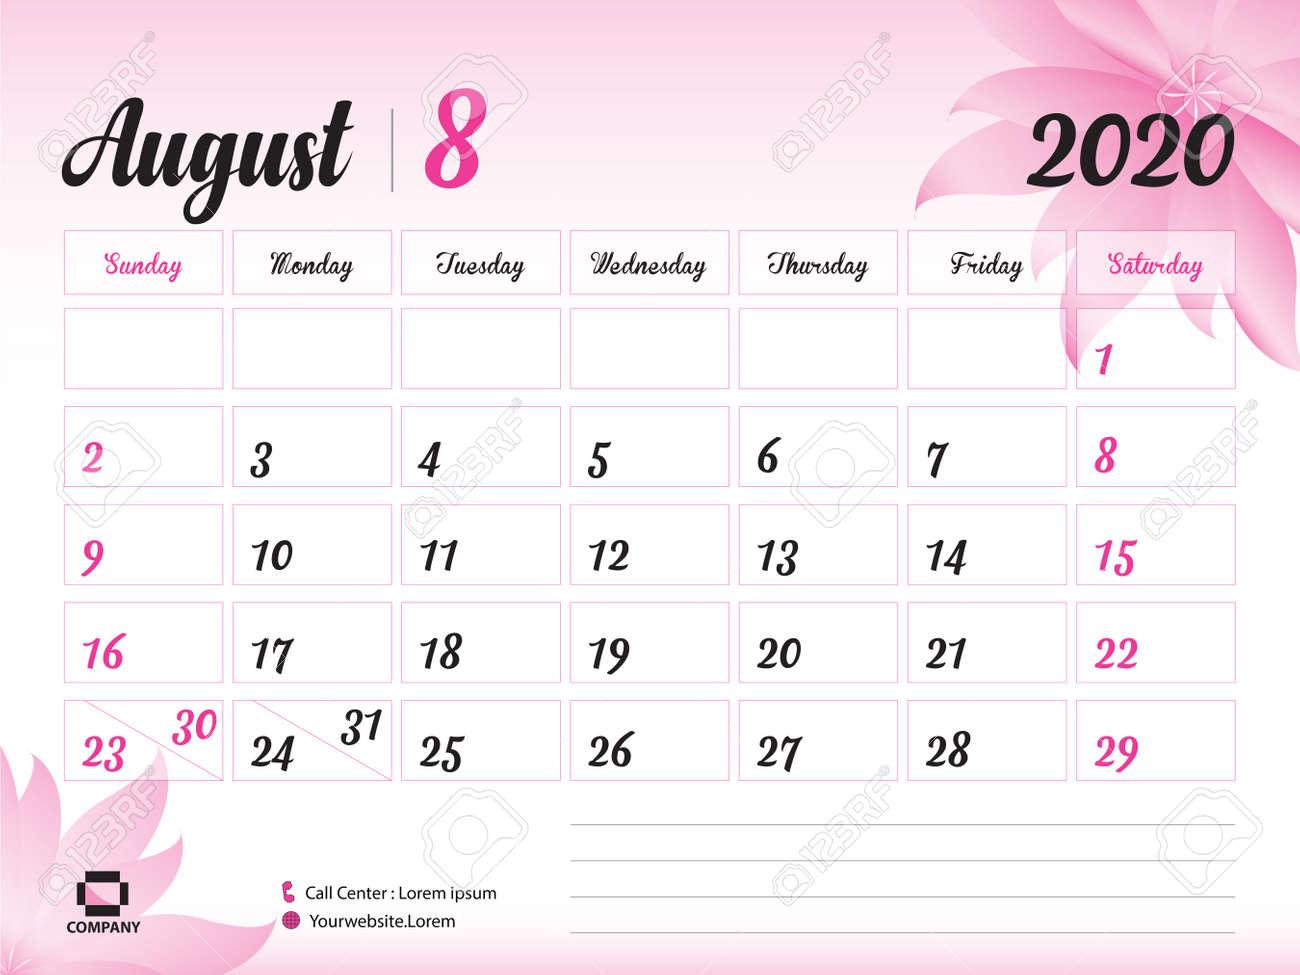 Printable Calendar August 2020.August 2020 Year Template Calendar 2020 Desk Calendar Design